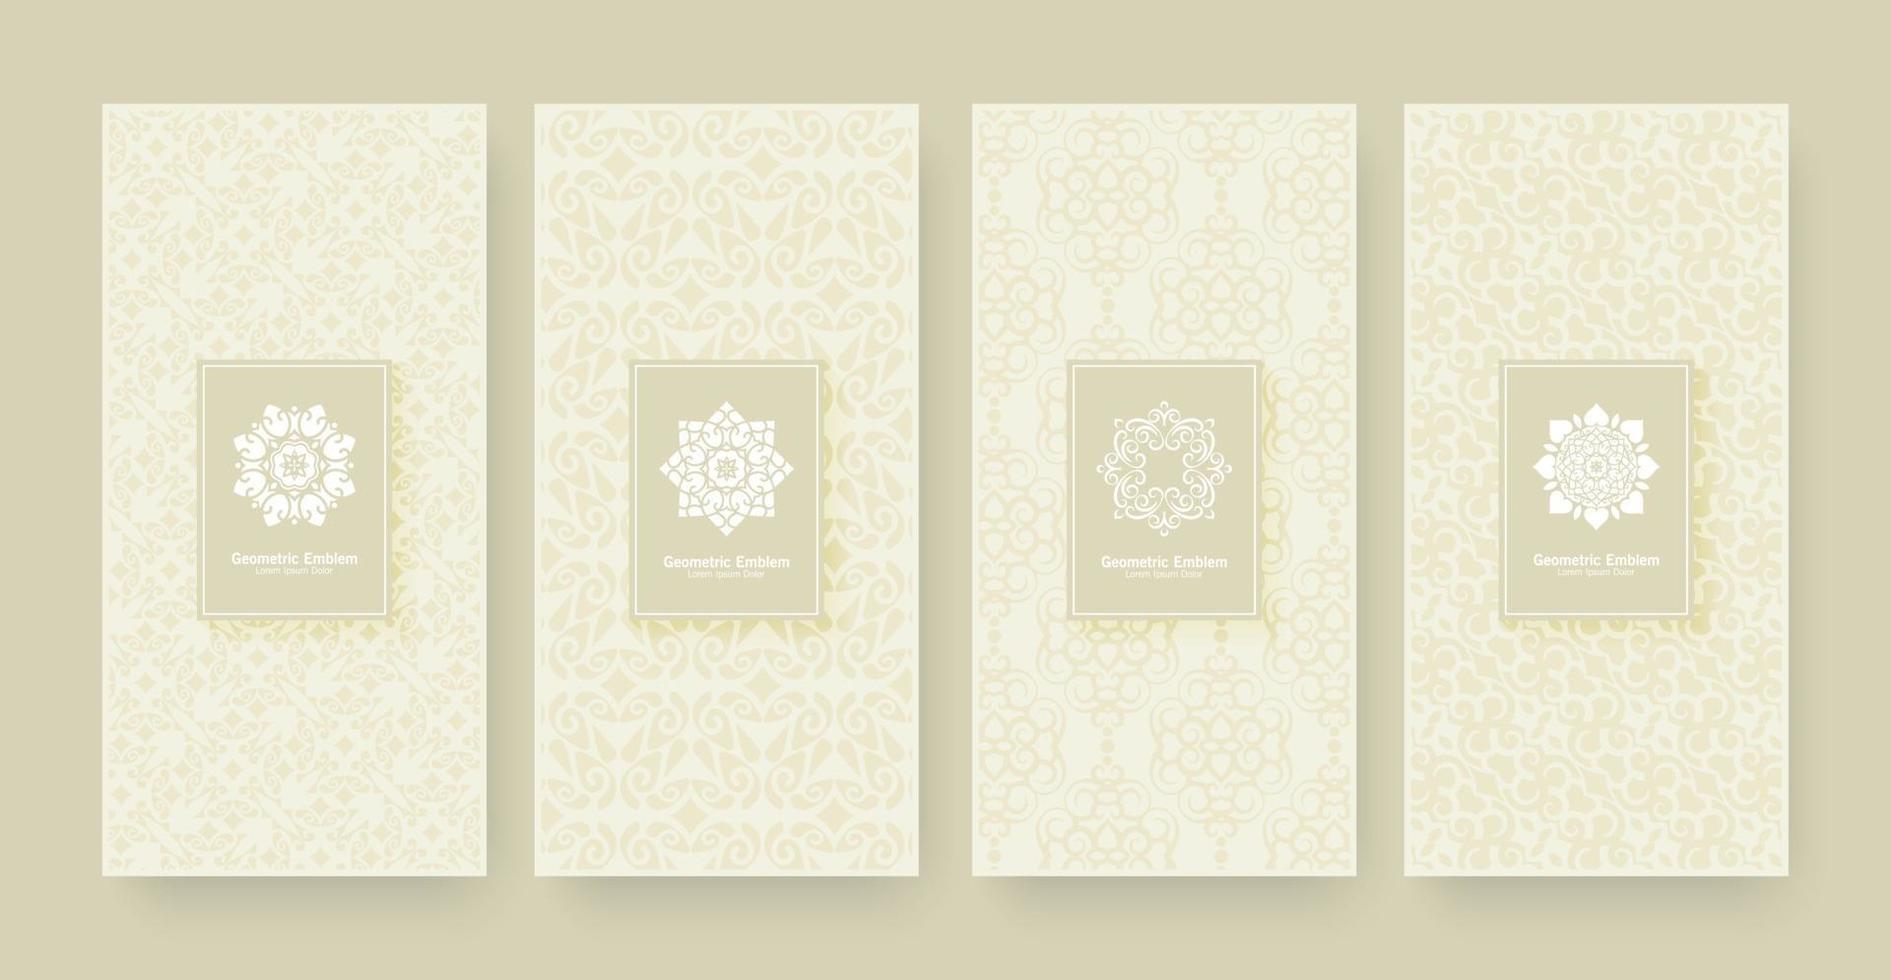 eleganter Banner Ornament Muster Design Hintergrund vektor